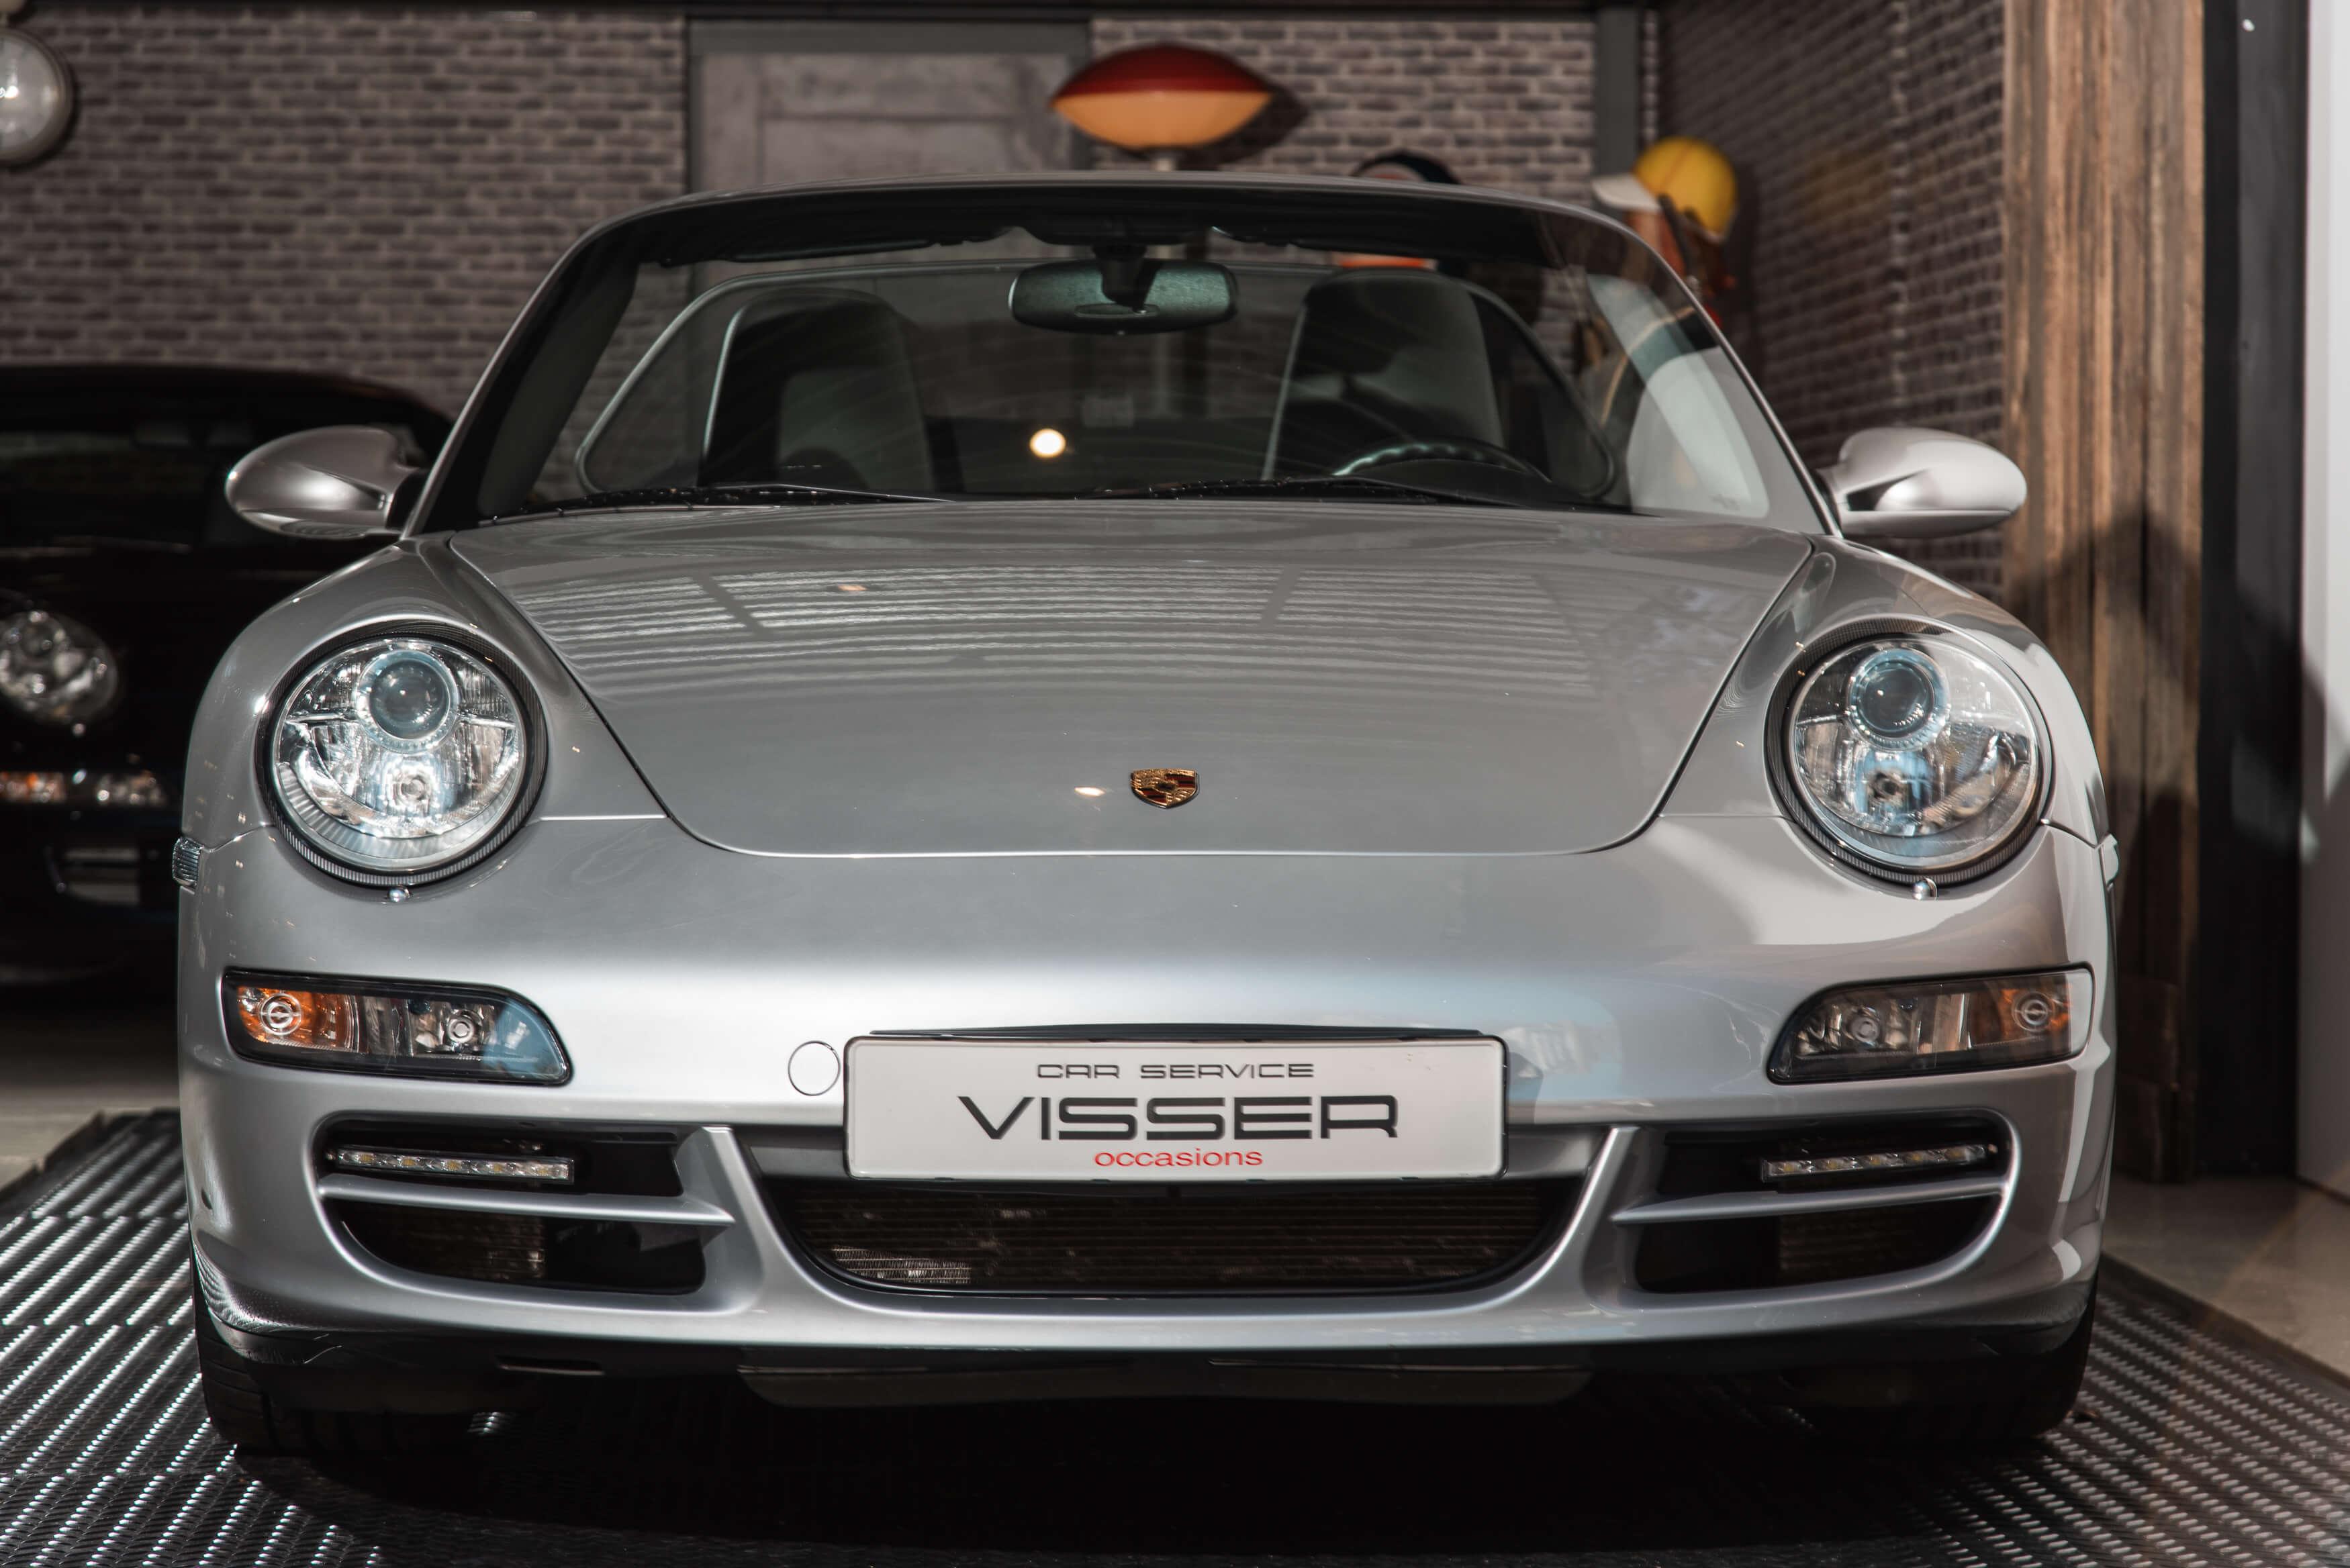 Porsche 997 Carrera 2 automaat Car Service Visser gespecialiseerd in Porsche - 1